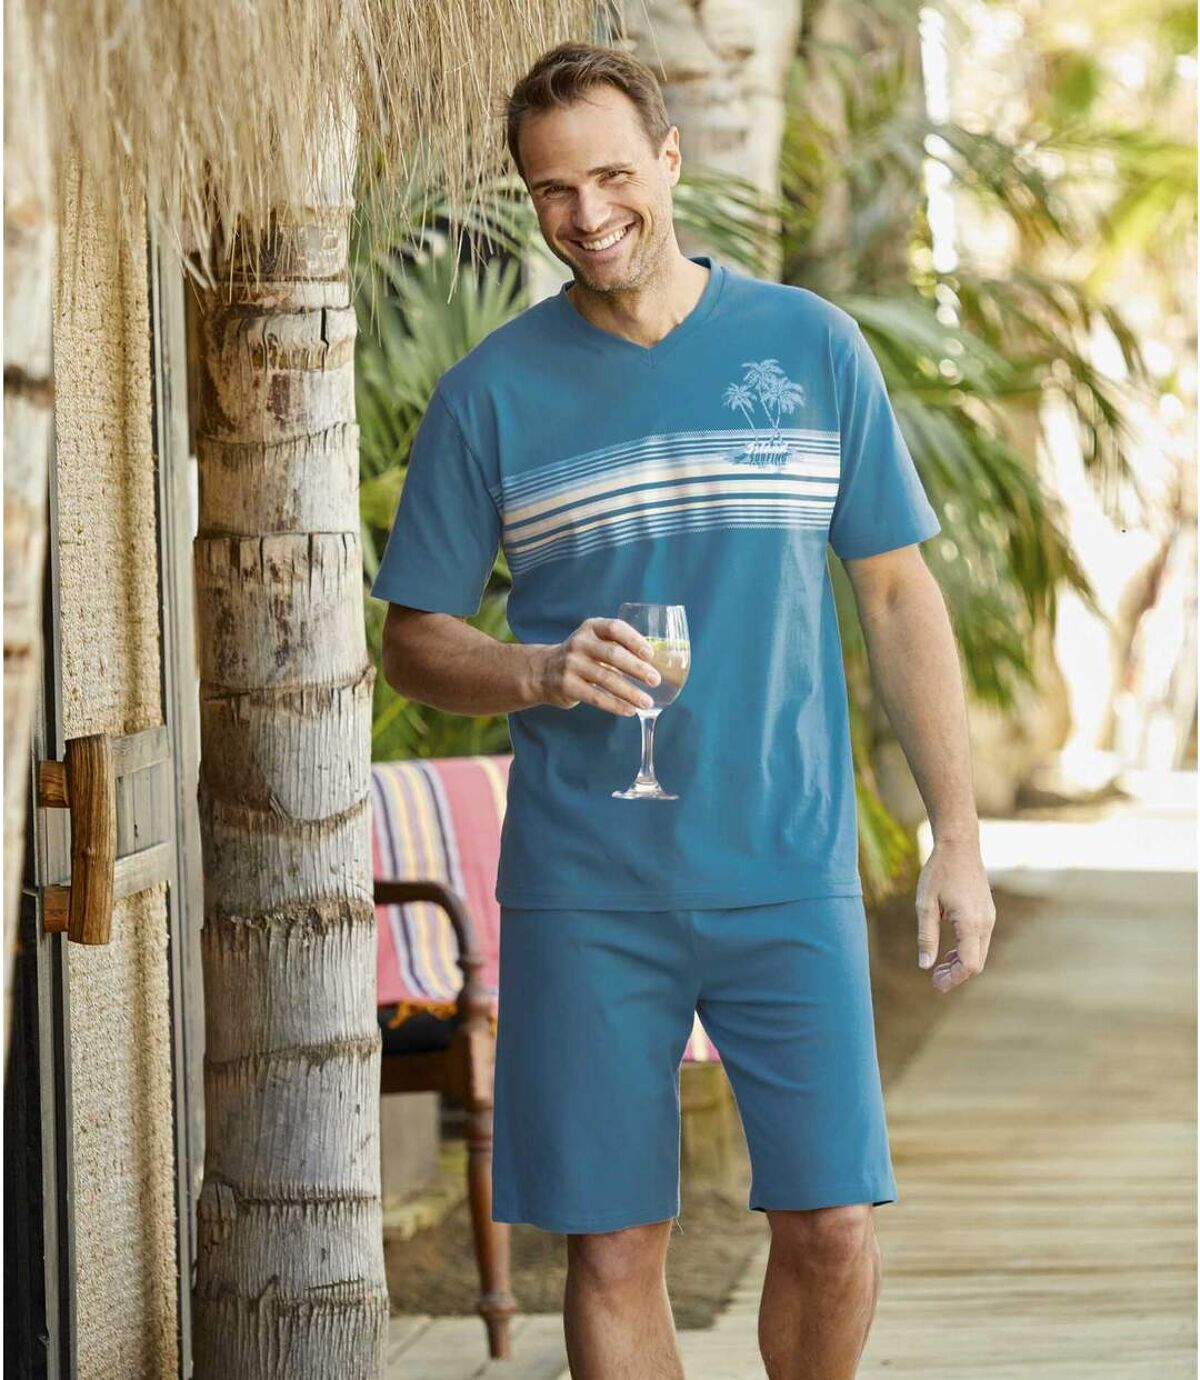 Krátke letné pyžamo Hawaï Surfing Atlas For Men